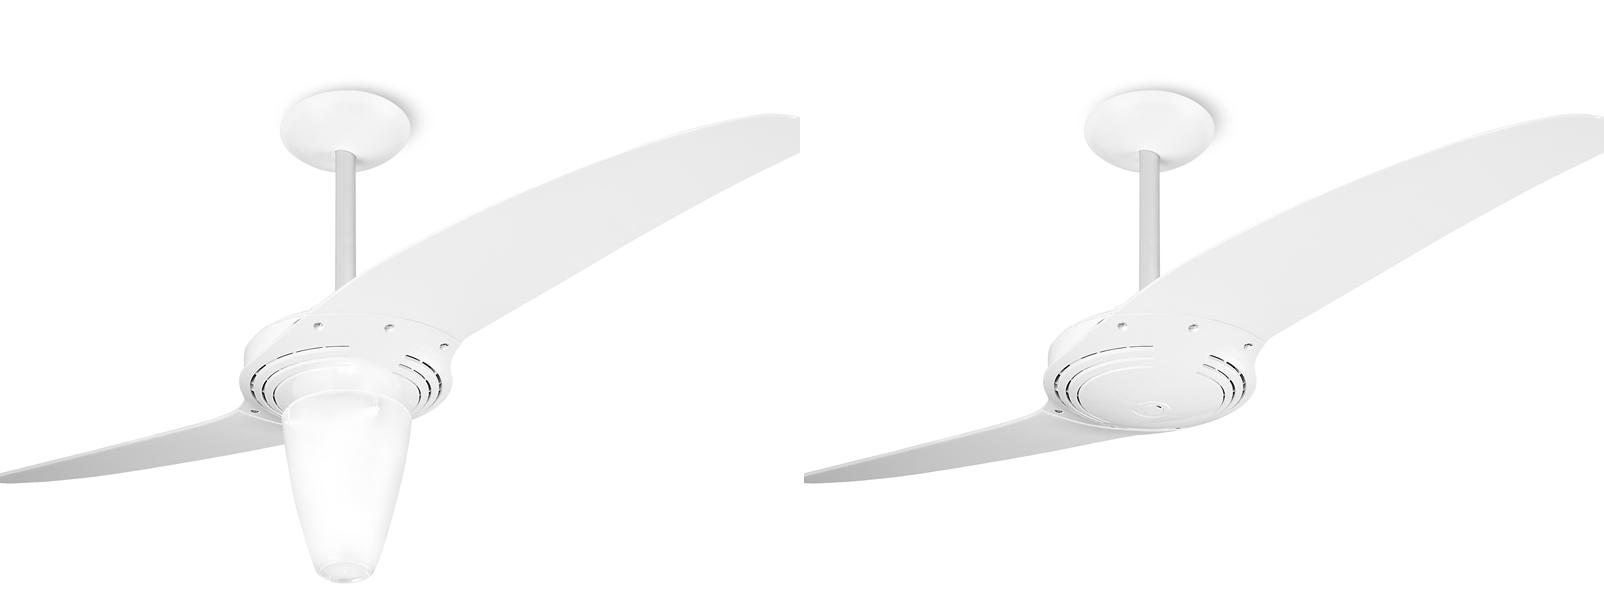 Ventilador de teto Spirit - Blog Myspirit - ventilador de teto Spirit 201 Branco com lustre cônico - ventilador de teto com lustre